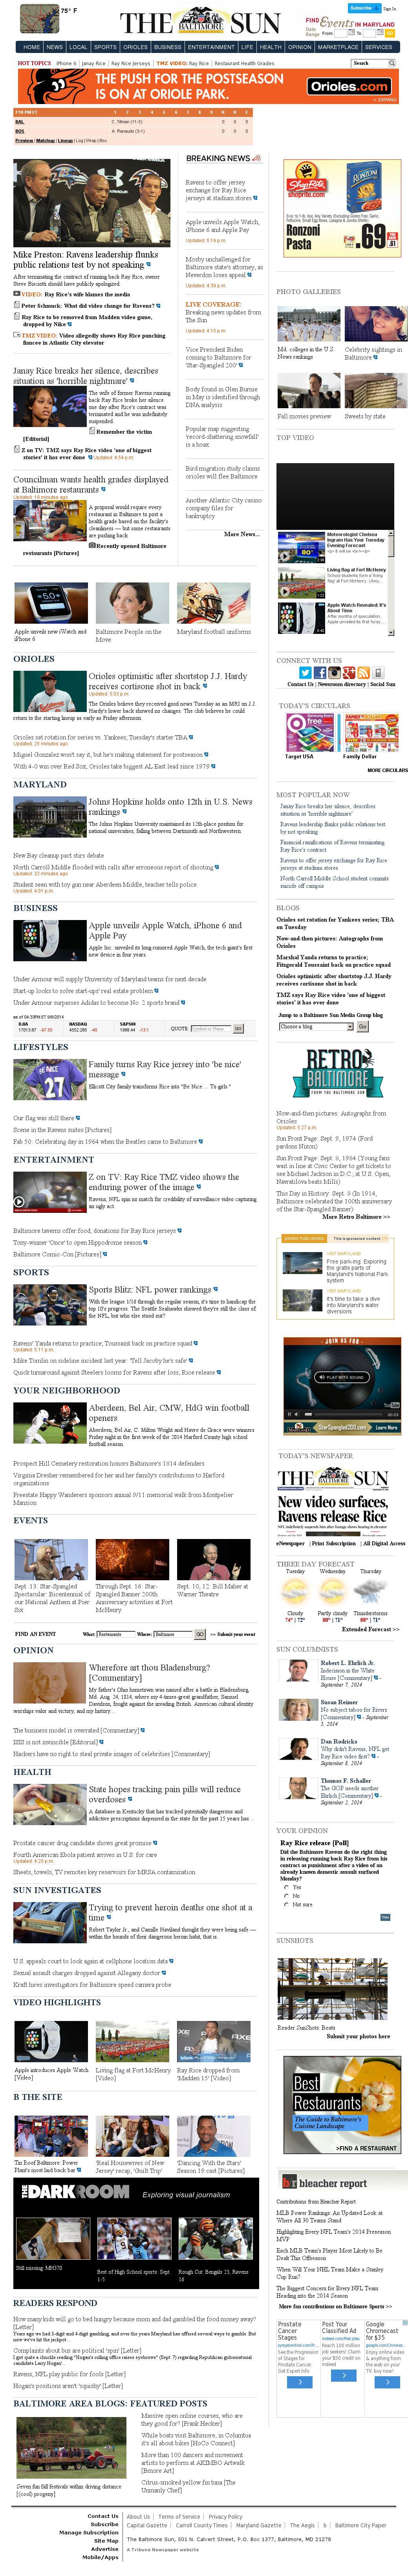 The Baltimore Sun at Tuesday Sept. 9, 2014, 11 p.m. UTC